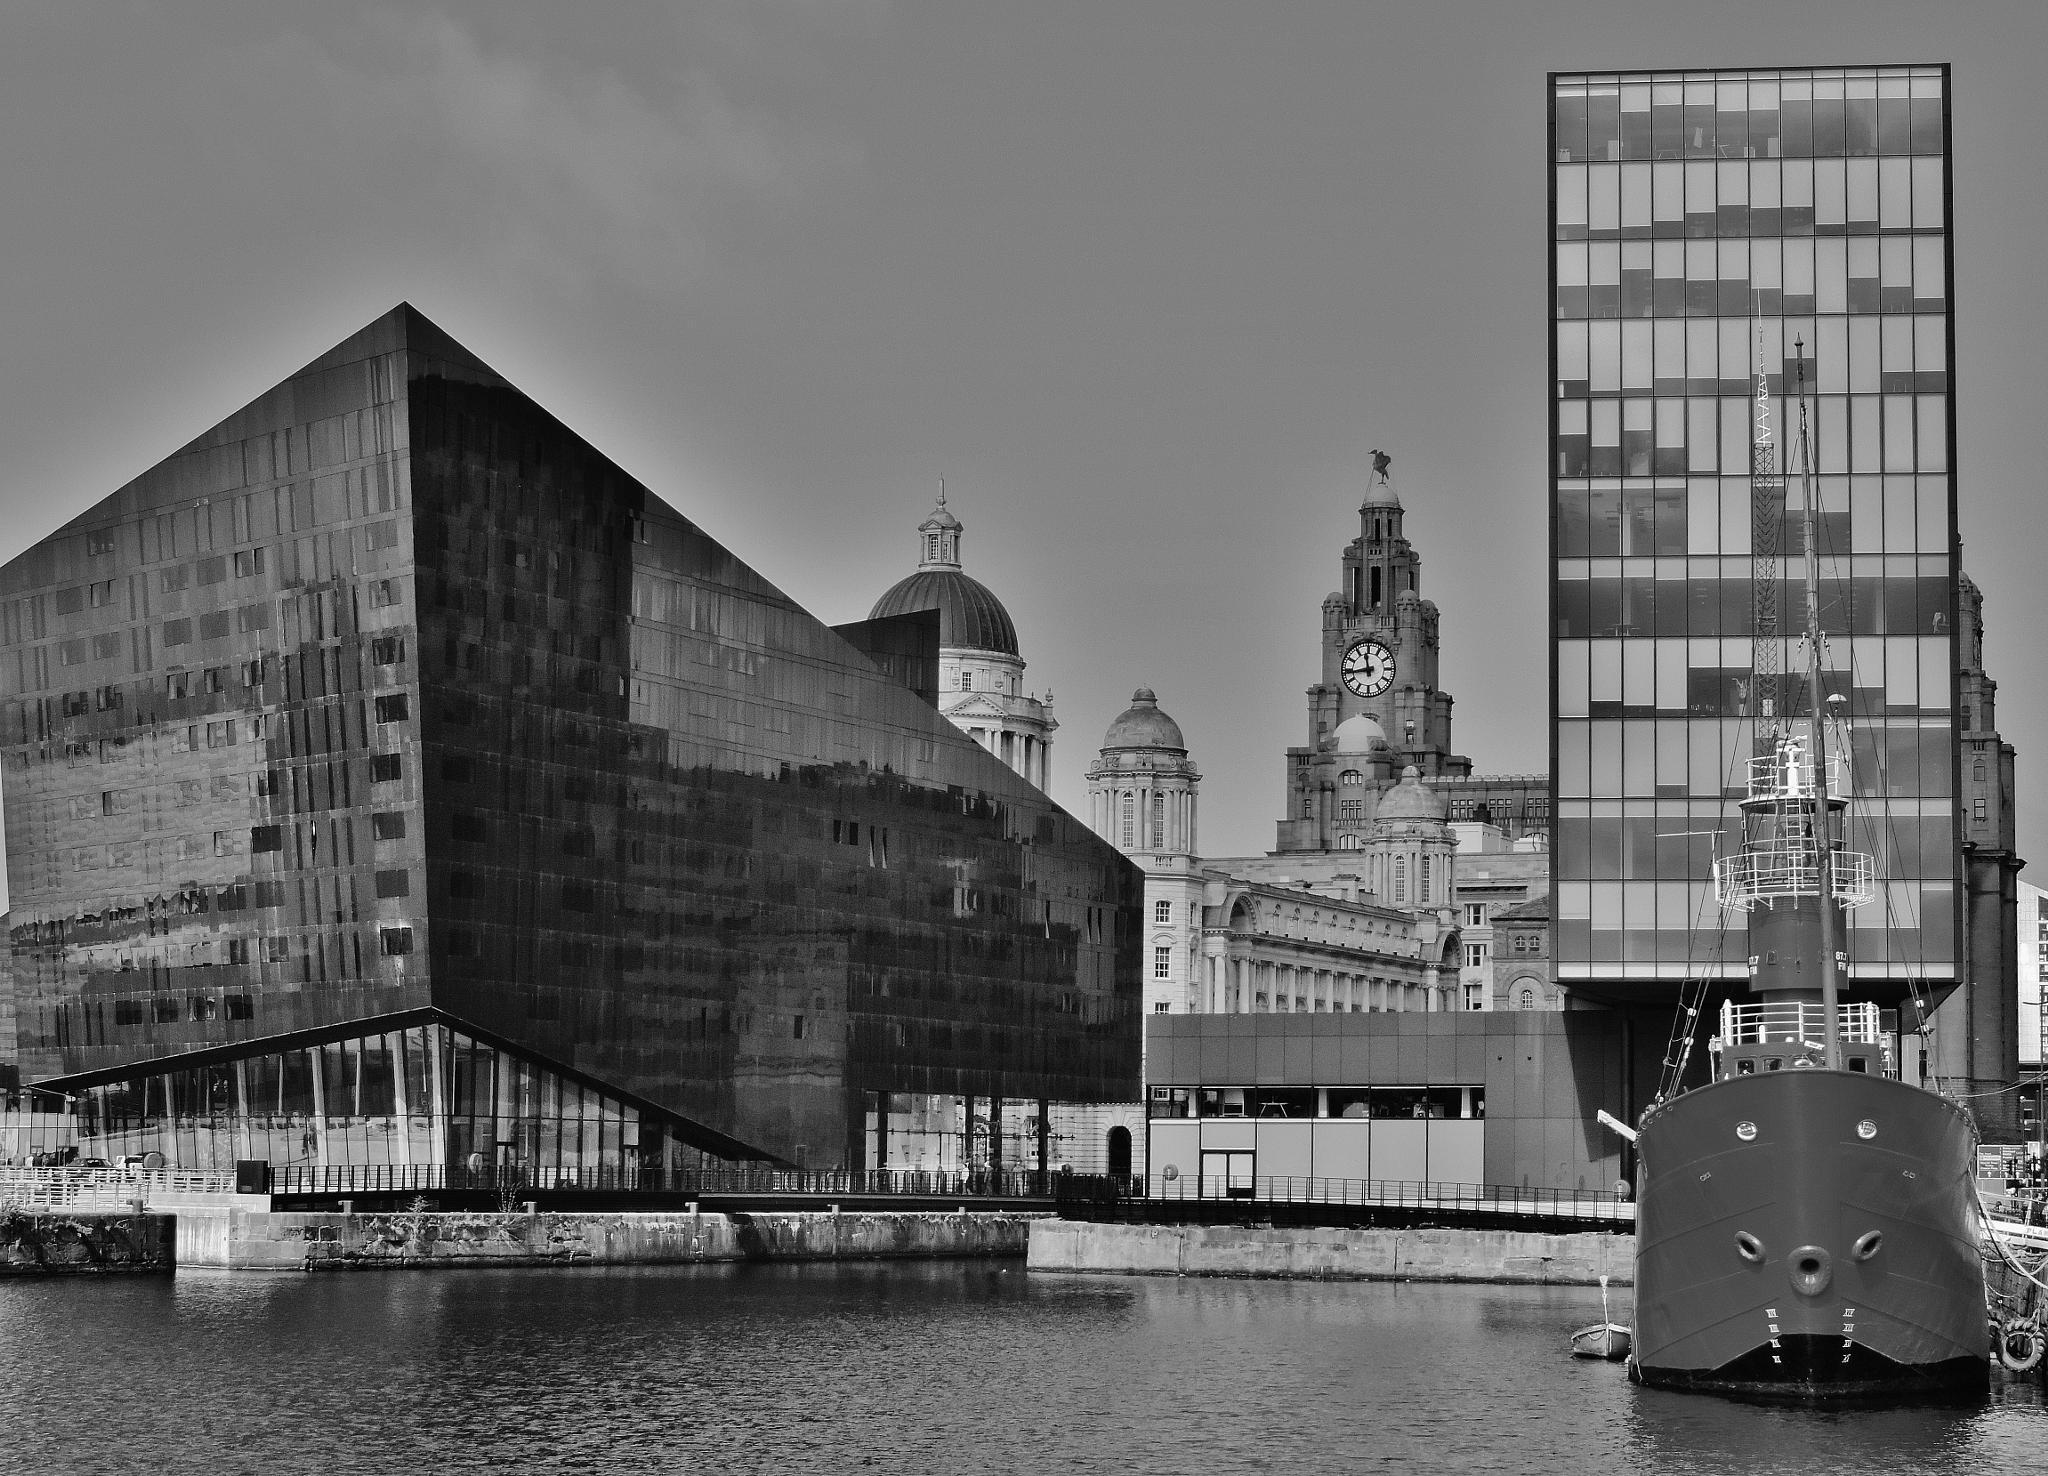 Liverpool docks by mountainpiguk